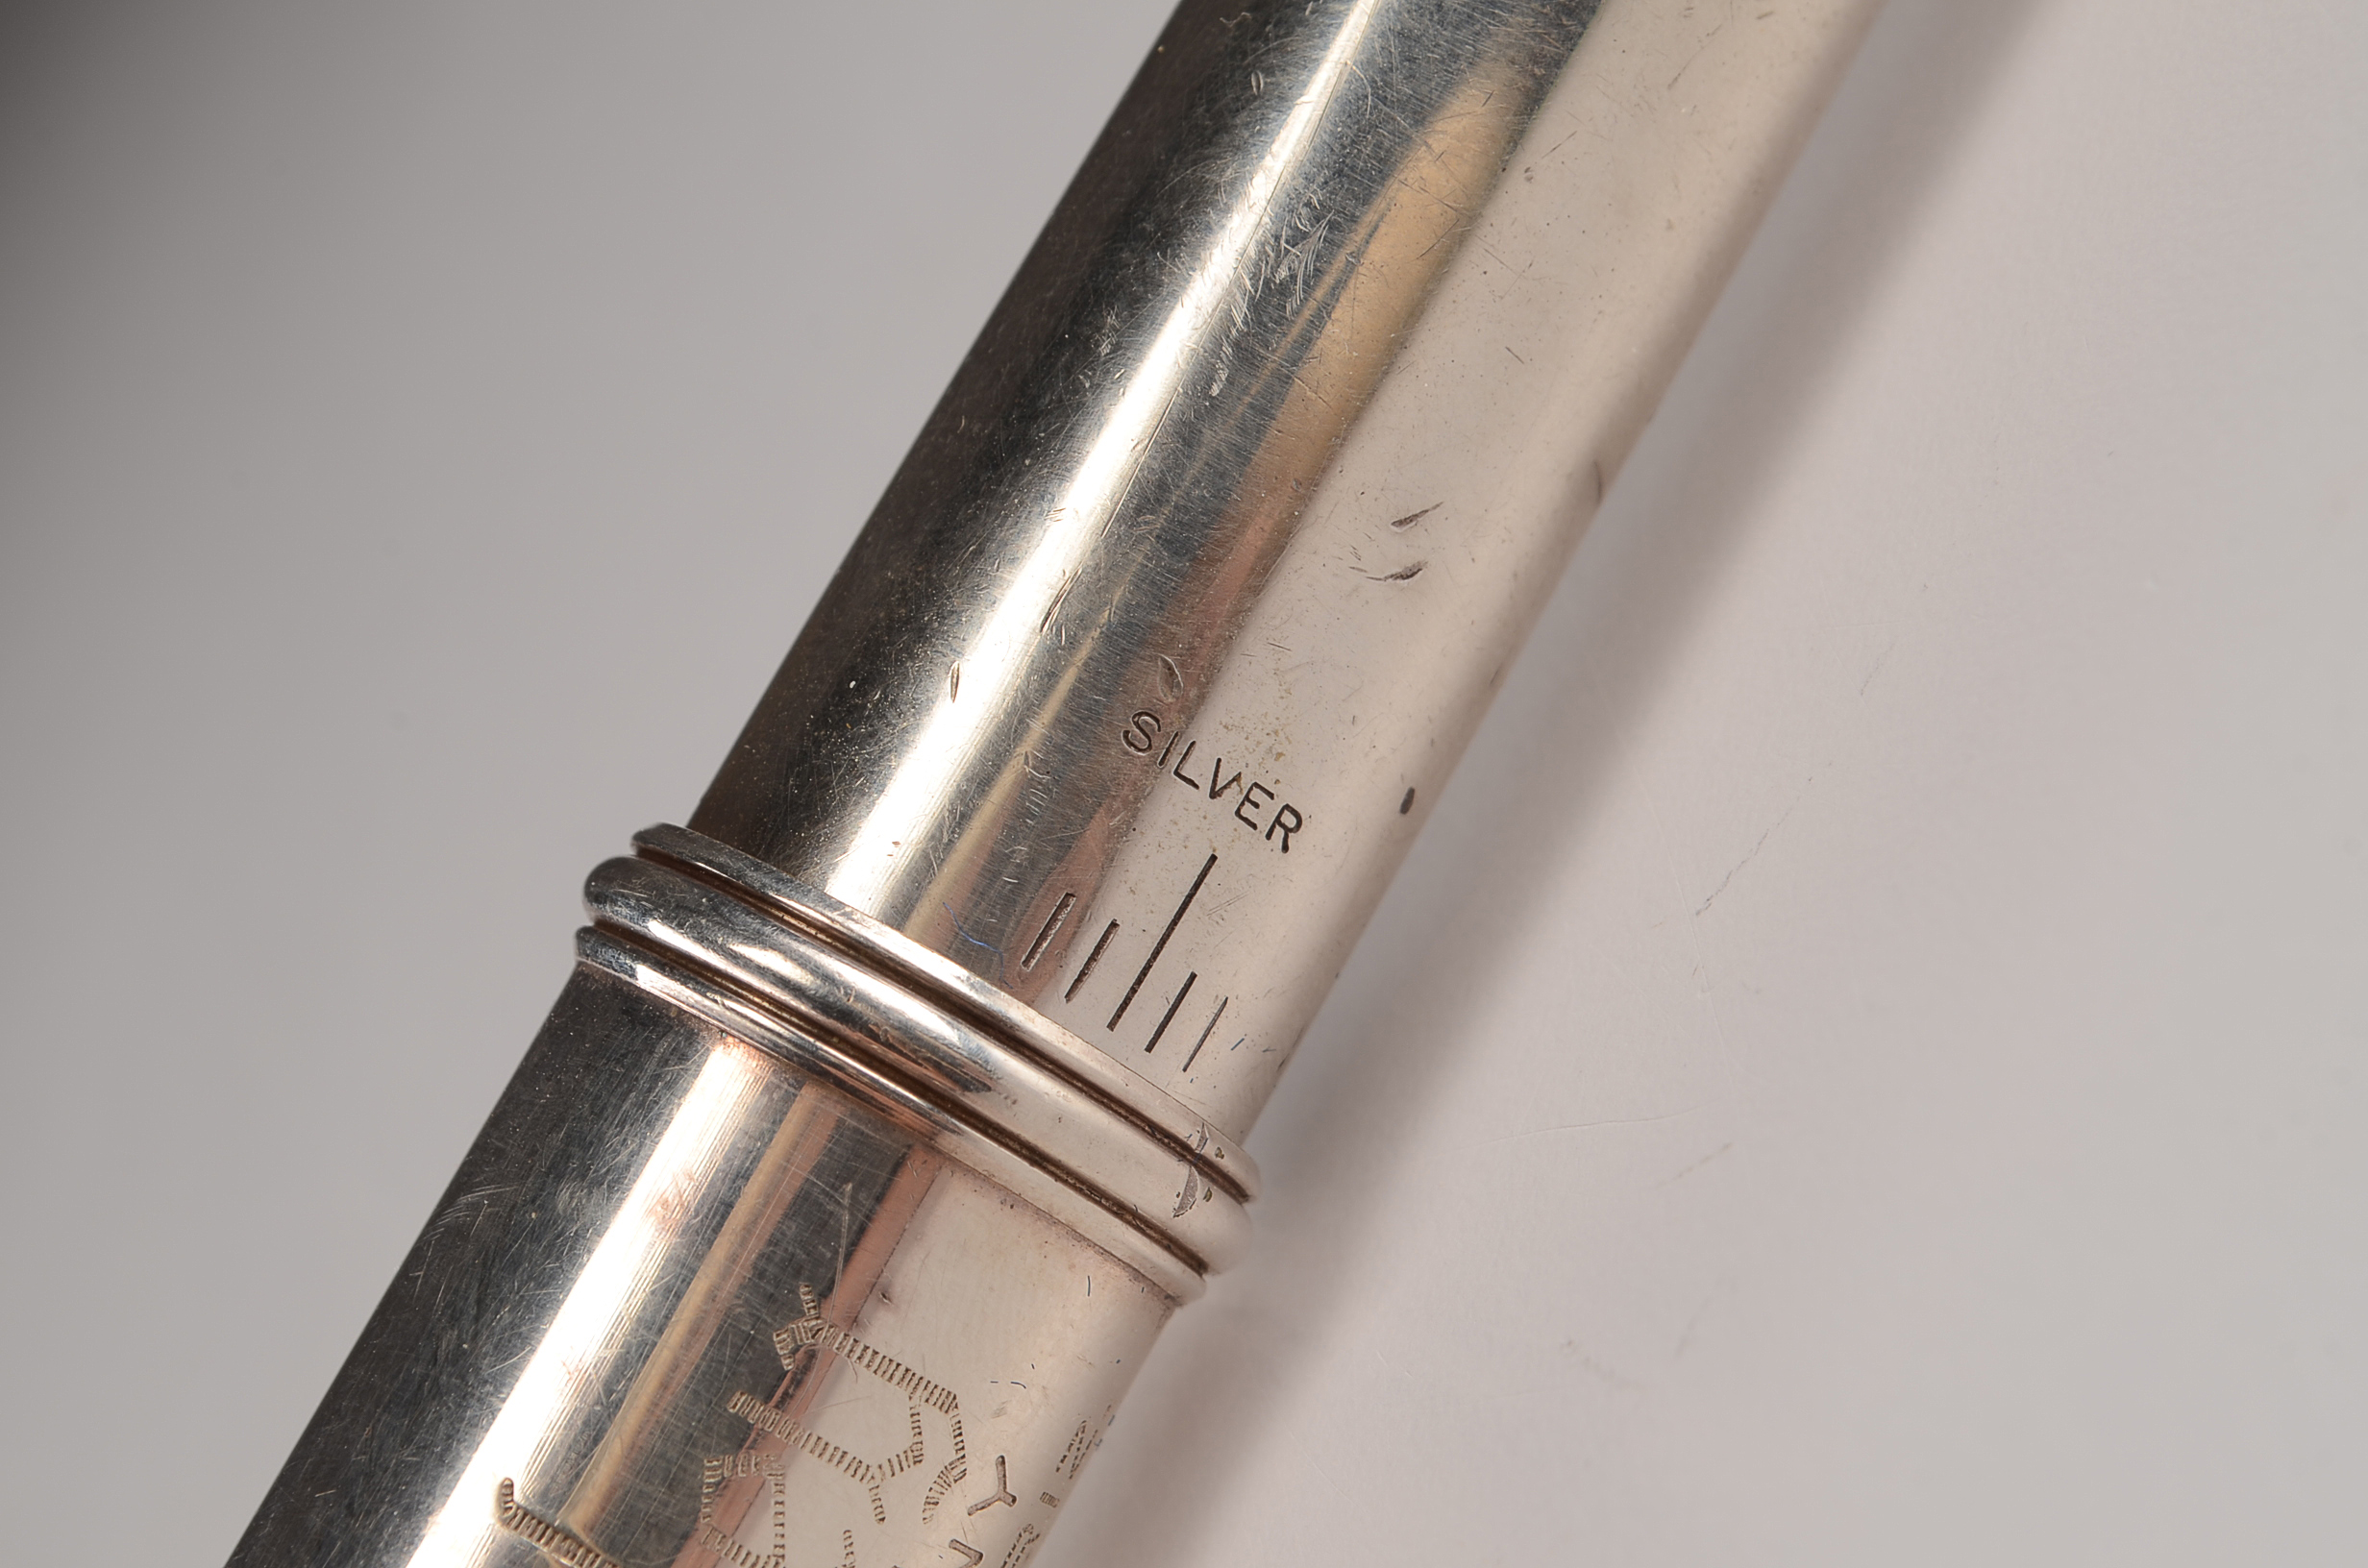 Artley flute key generator